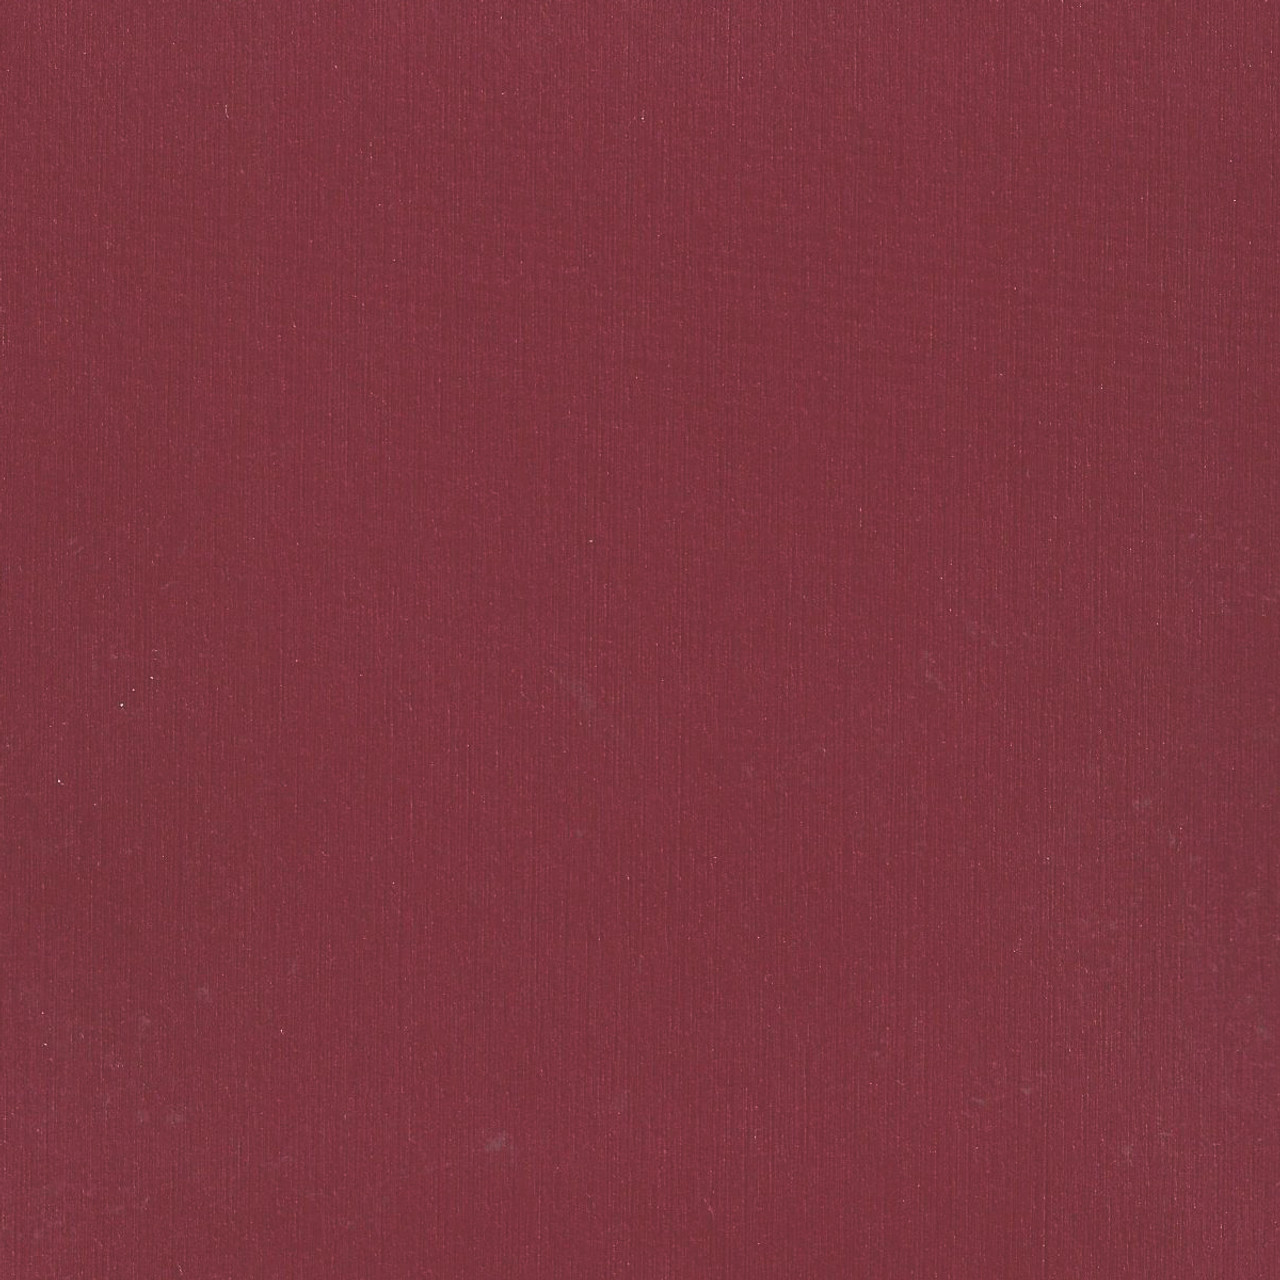 Reflex Marine Quality RMQ-7854 Pro Tour Red